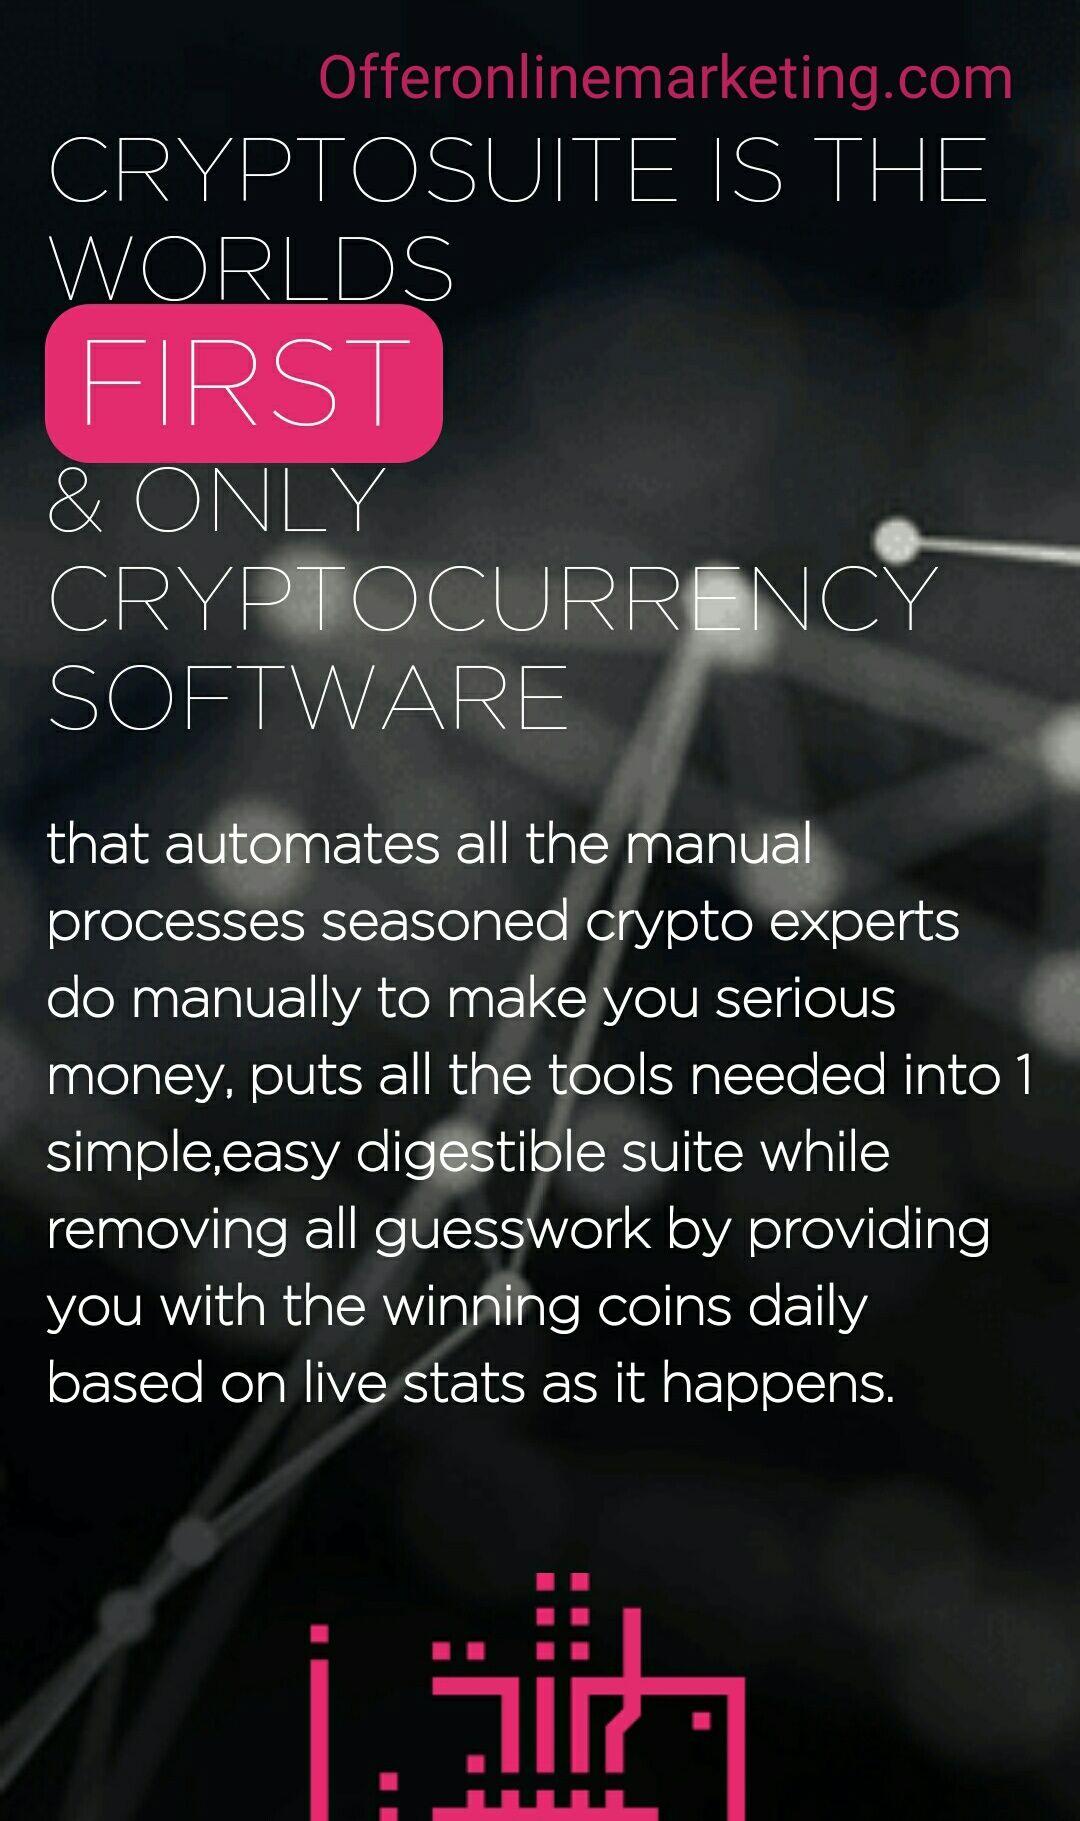 Crypto Currancy software crypto currency cryptomoney